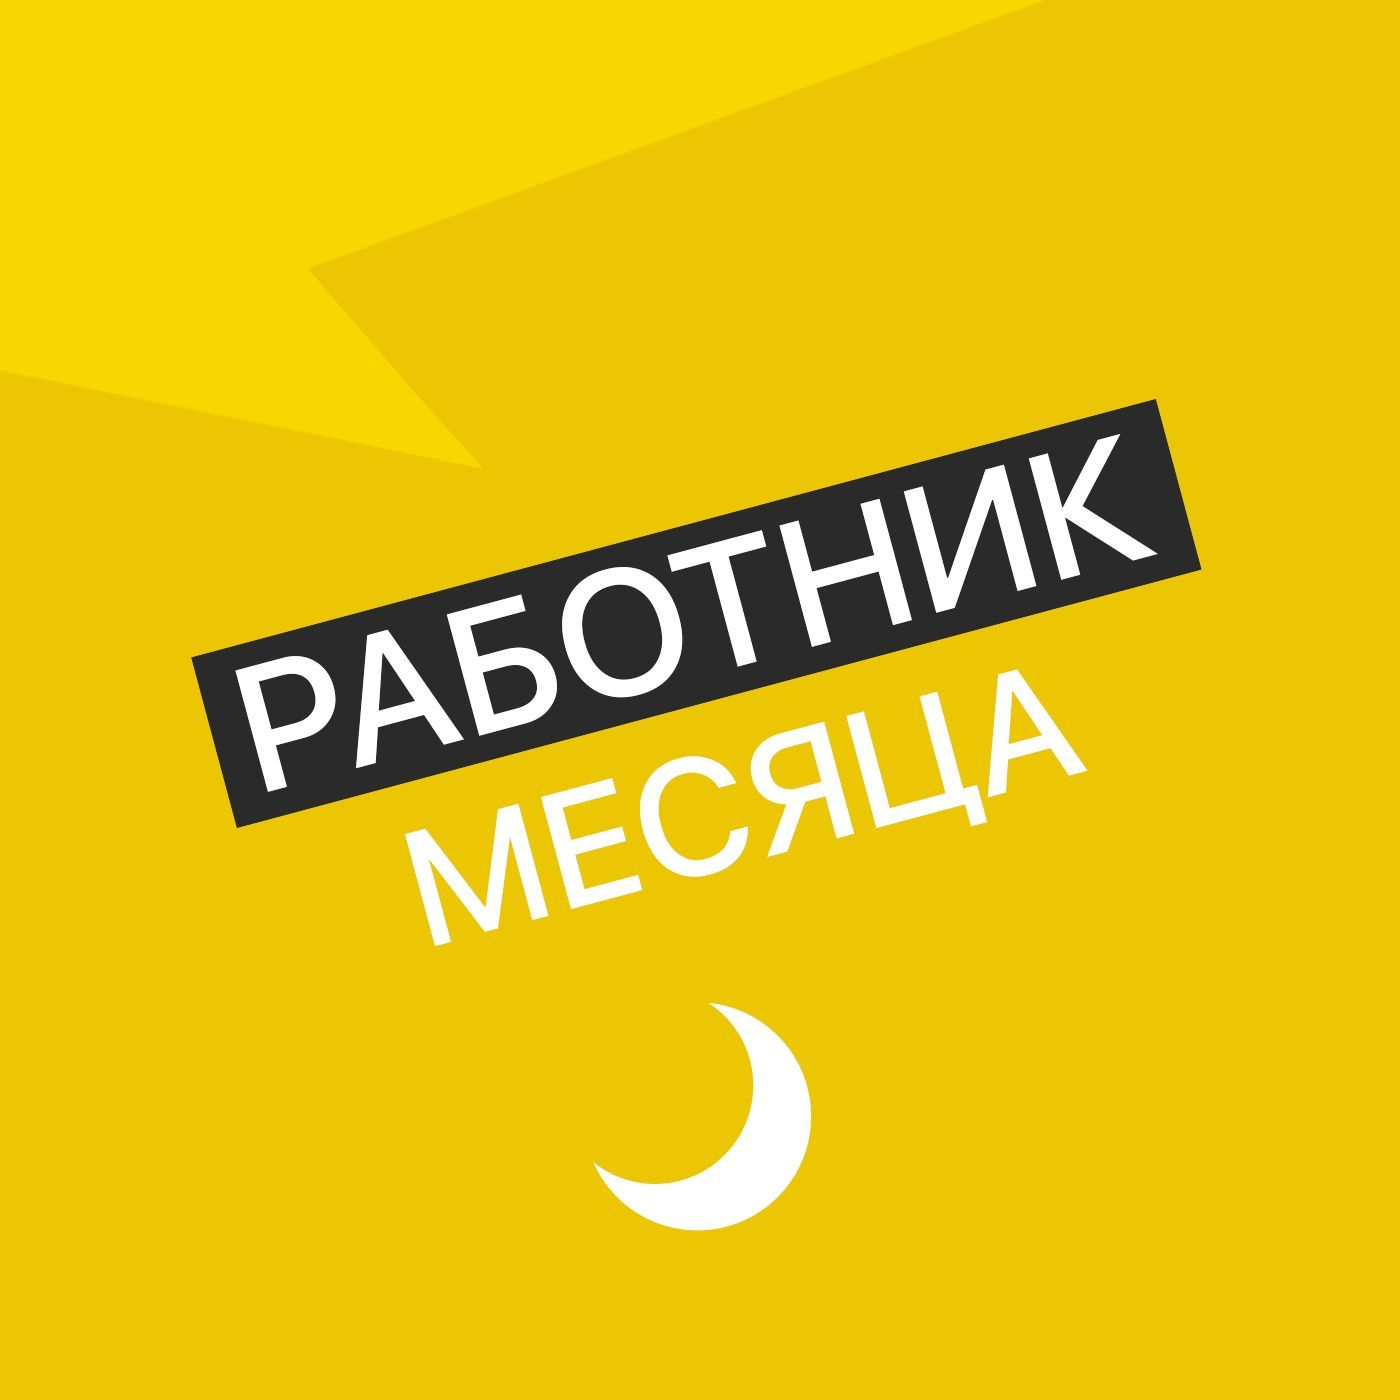 Творческий коллектив Mojomedia Артдиректор бара марат карапетян арт директор